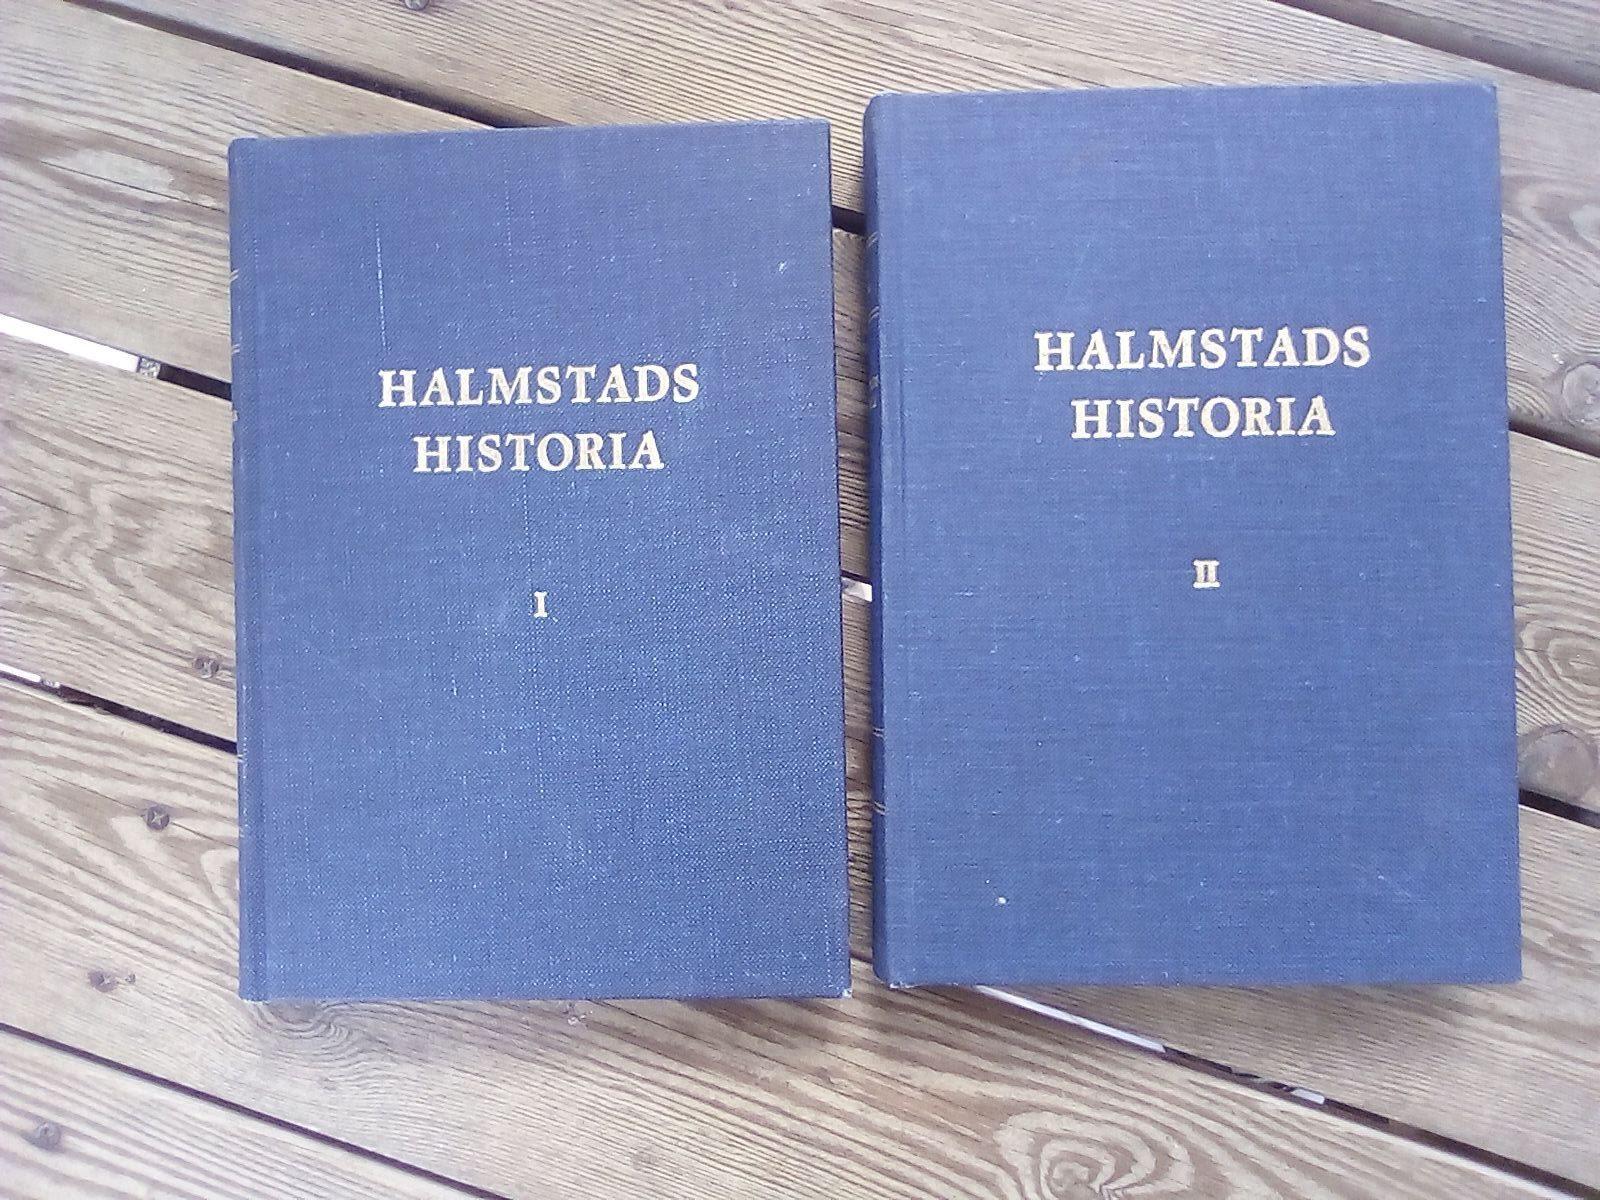 Halmstads Historia del 1+2